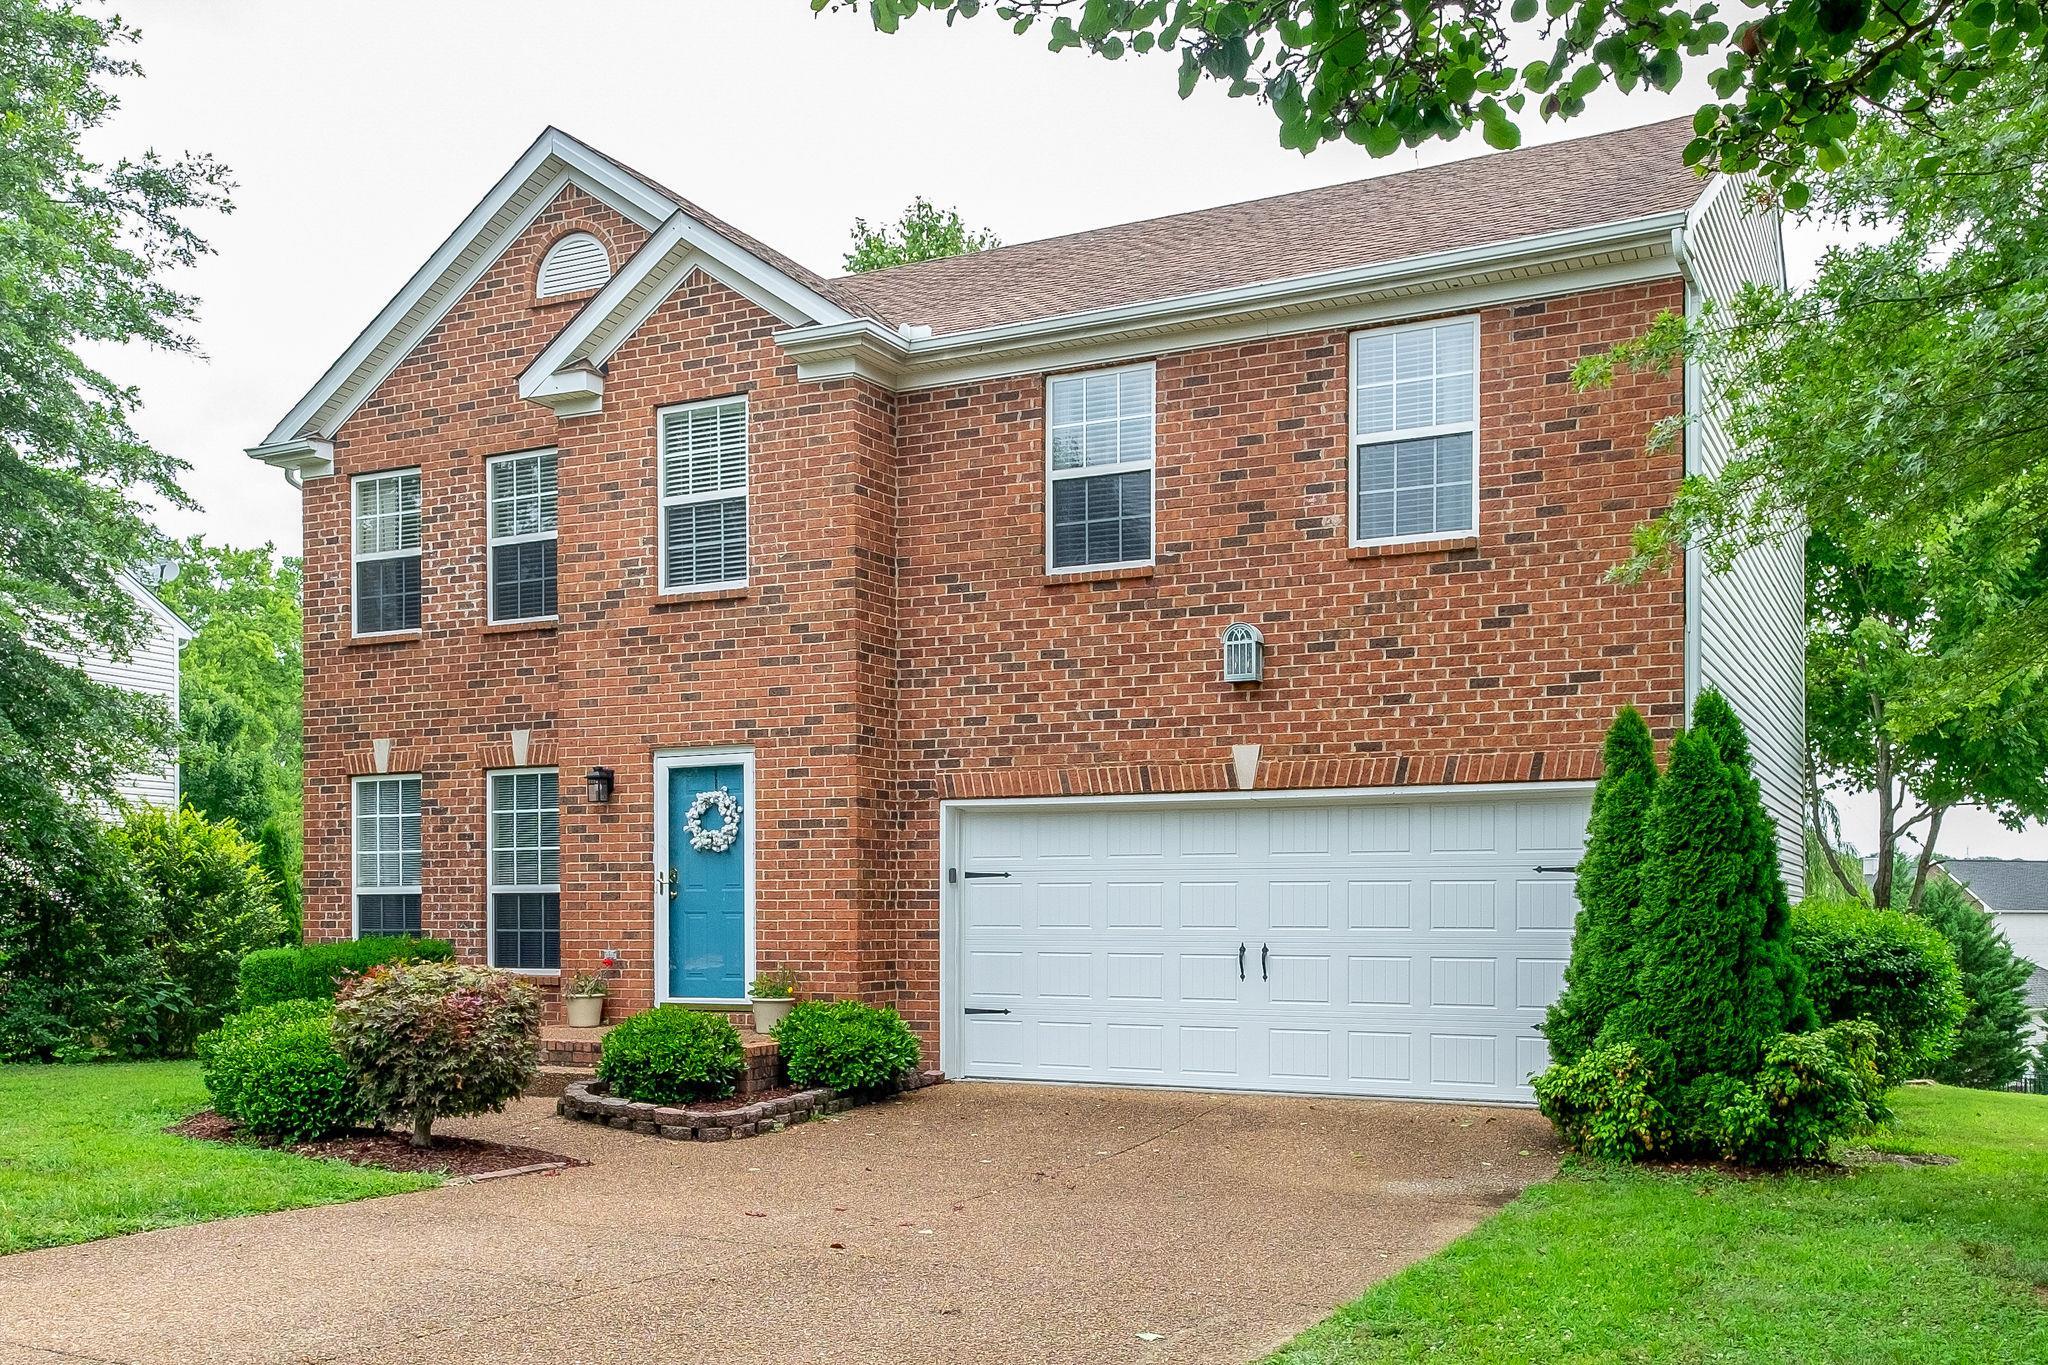 2936 Burtonwood Dr, Spring Hill, TN 37174 - Spring Hill, TN real estate listing